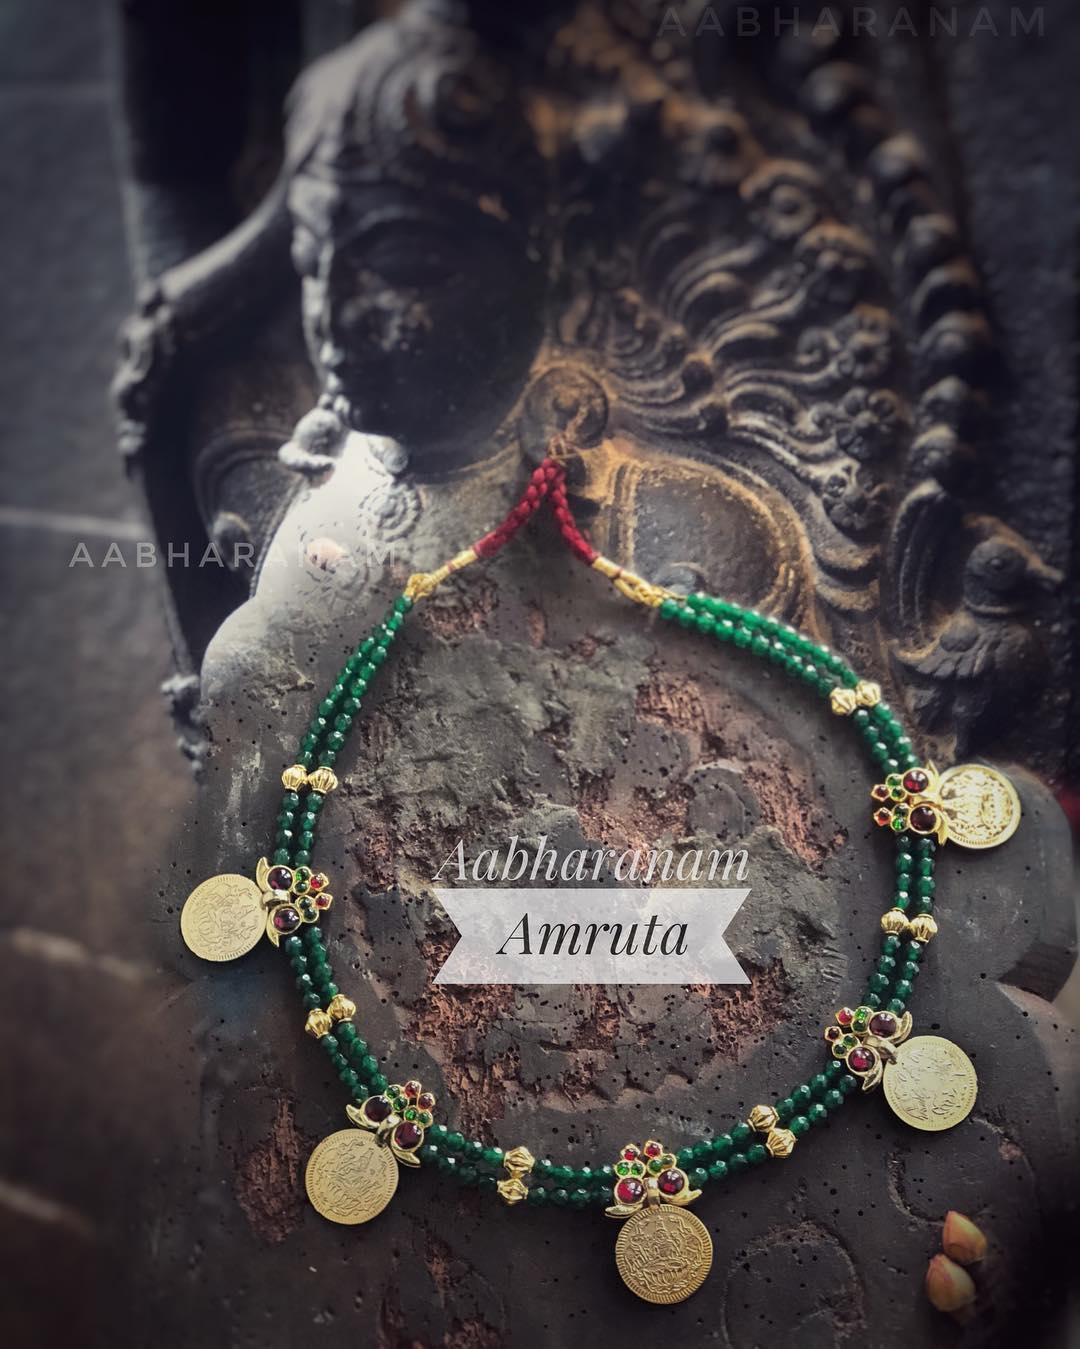 Cute Coin Kemp Necklace From Abharanam